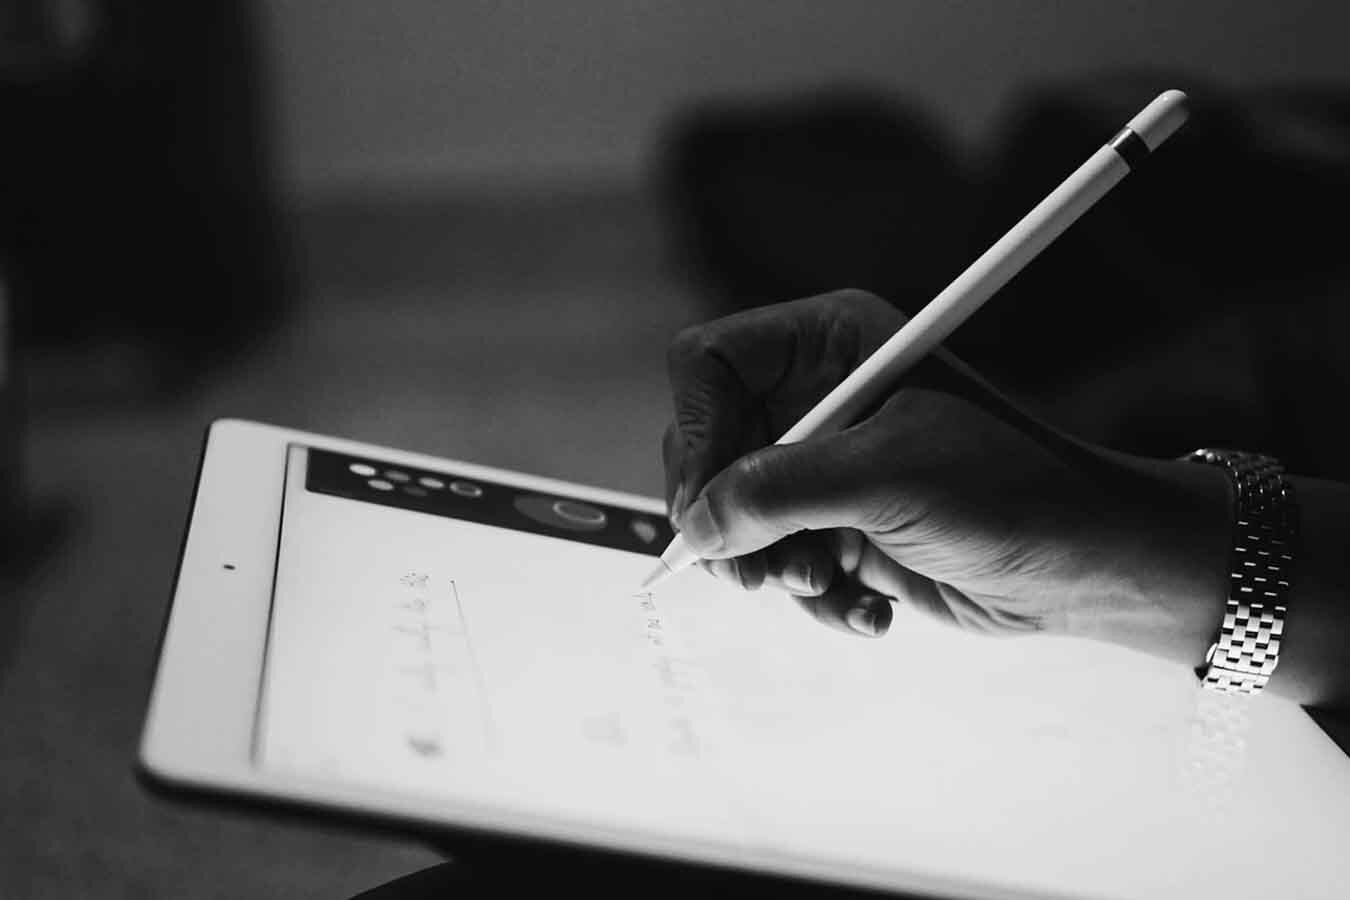 Best-cheap-drawing-tablet.jpg